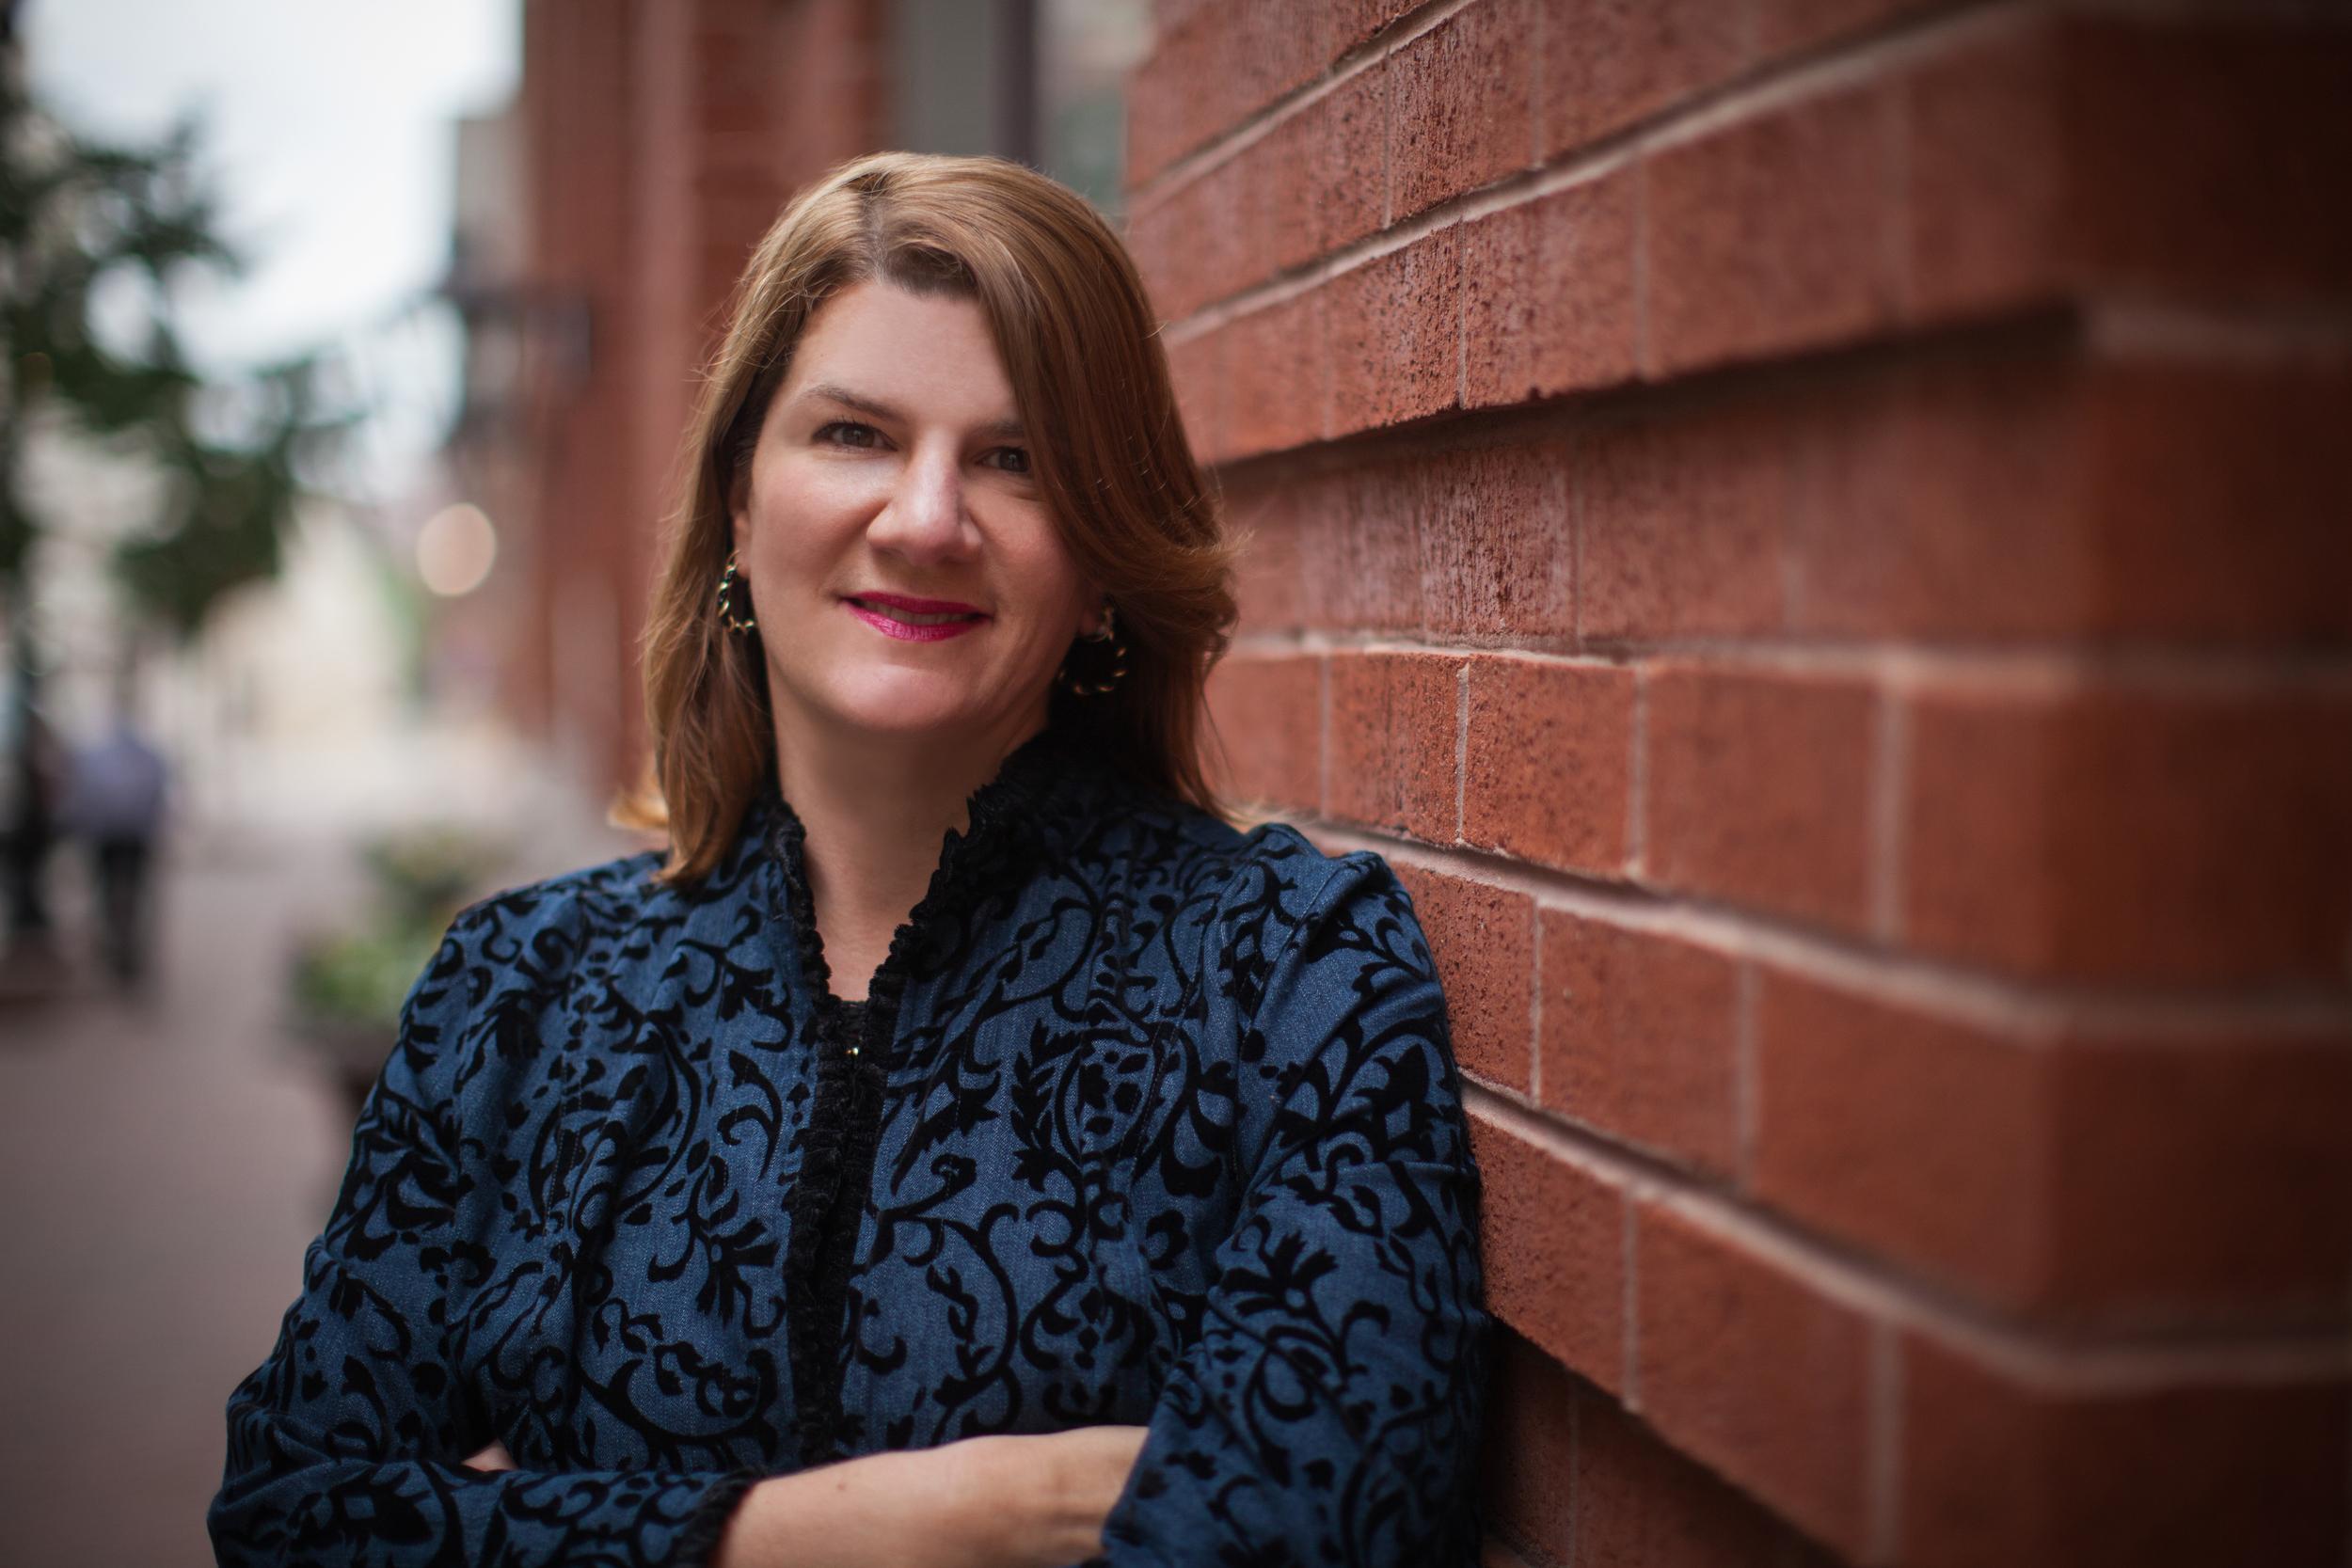 Mariia Zimmerman, Founder and Principal of MZ Strategies, LLC